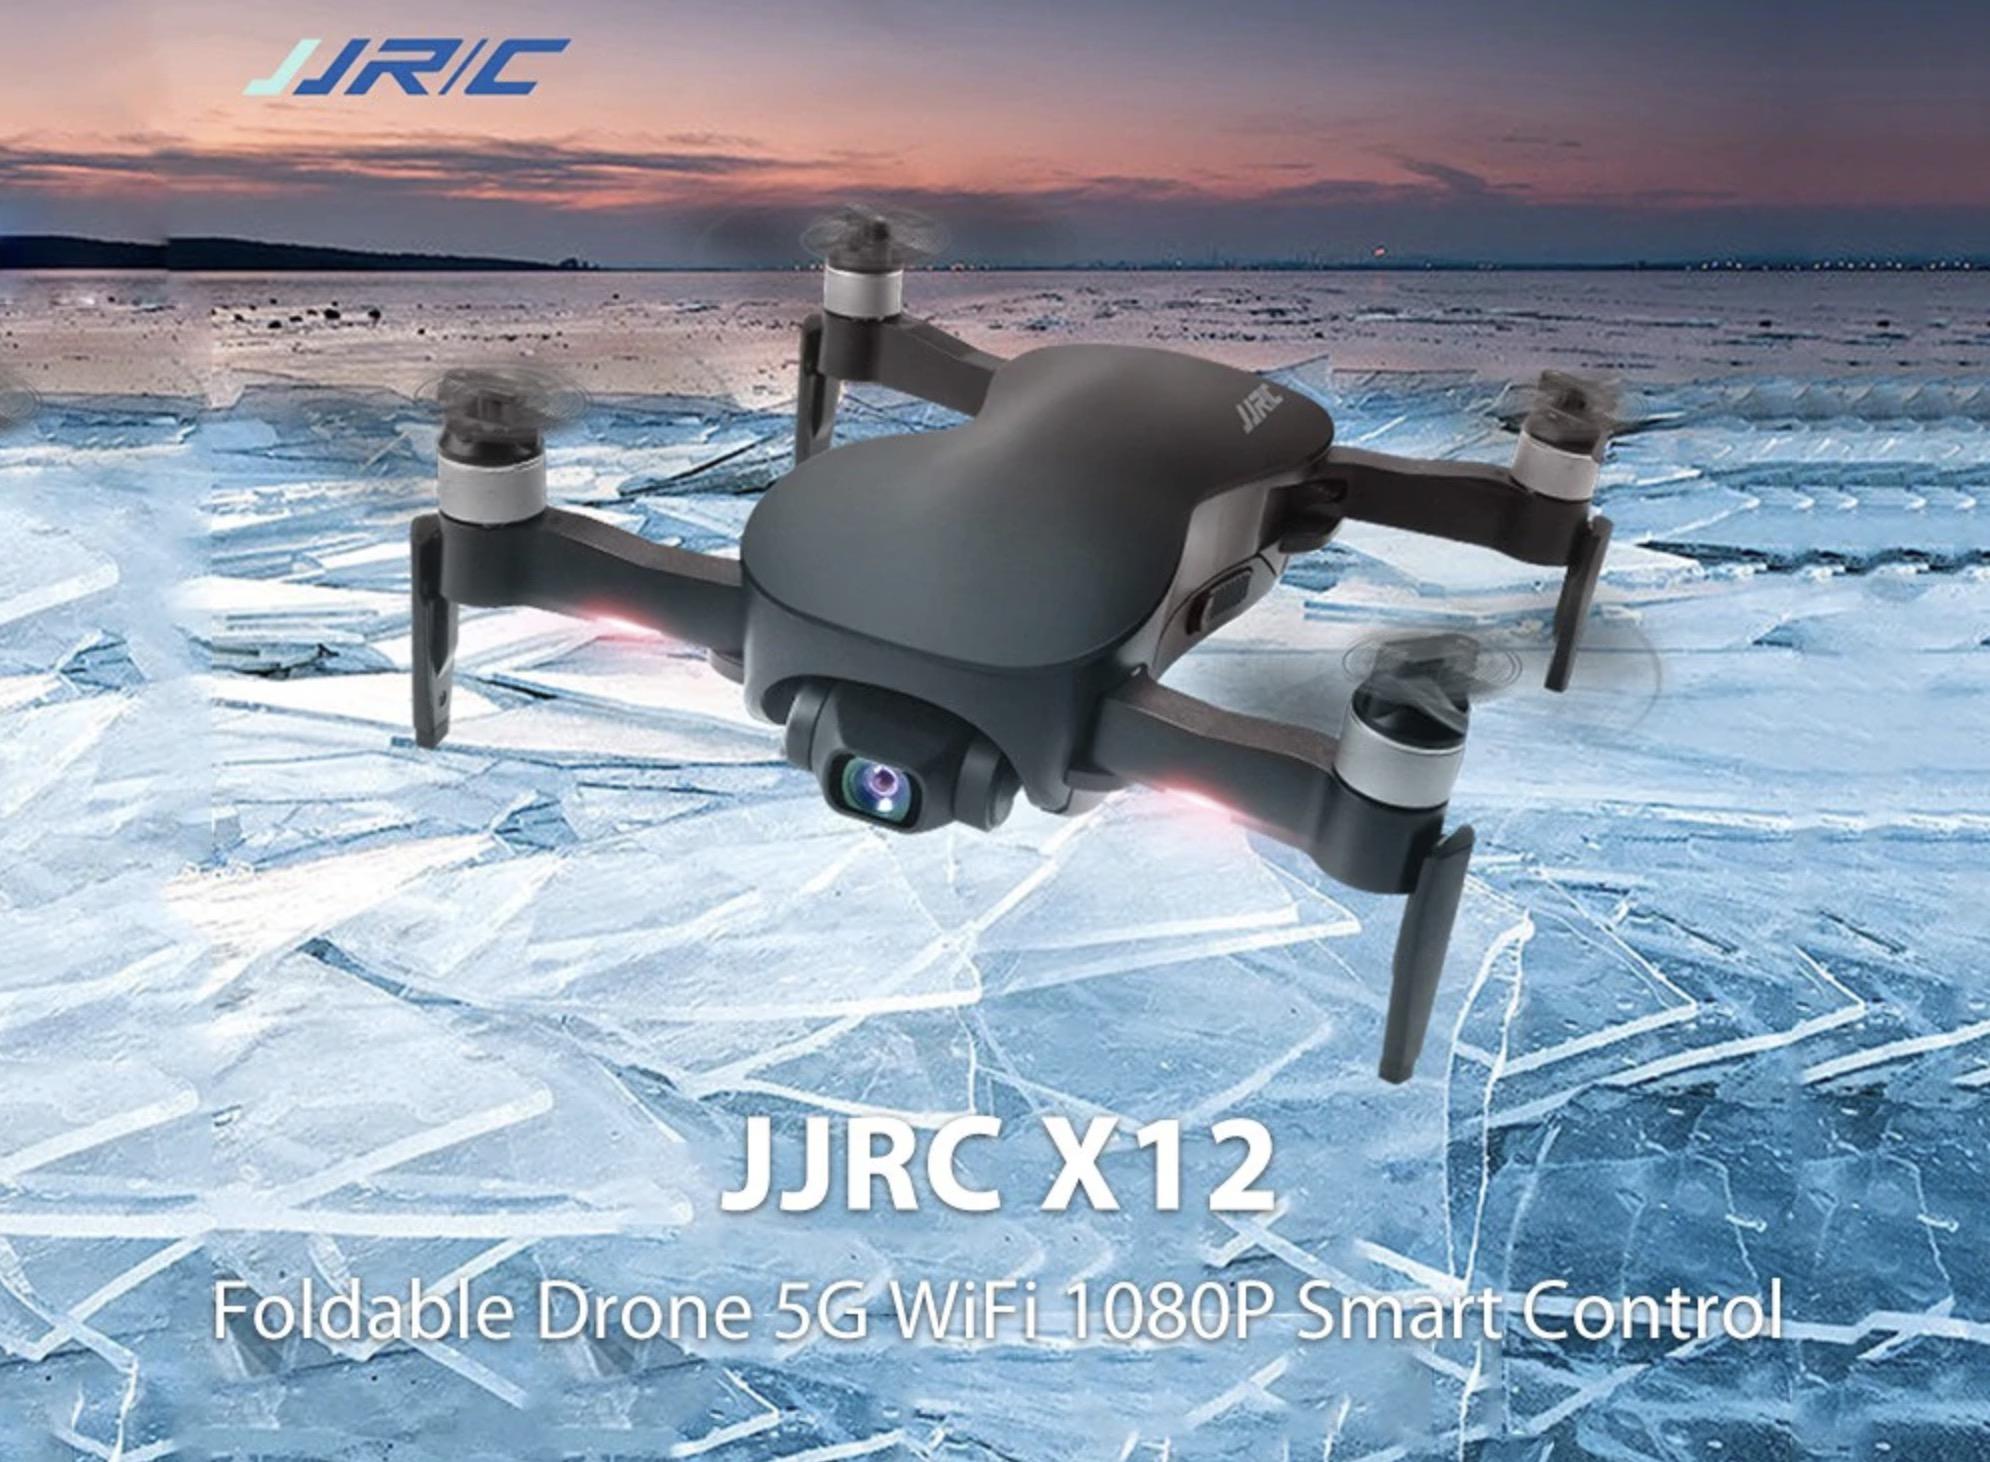 JJRC X12